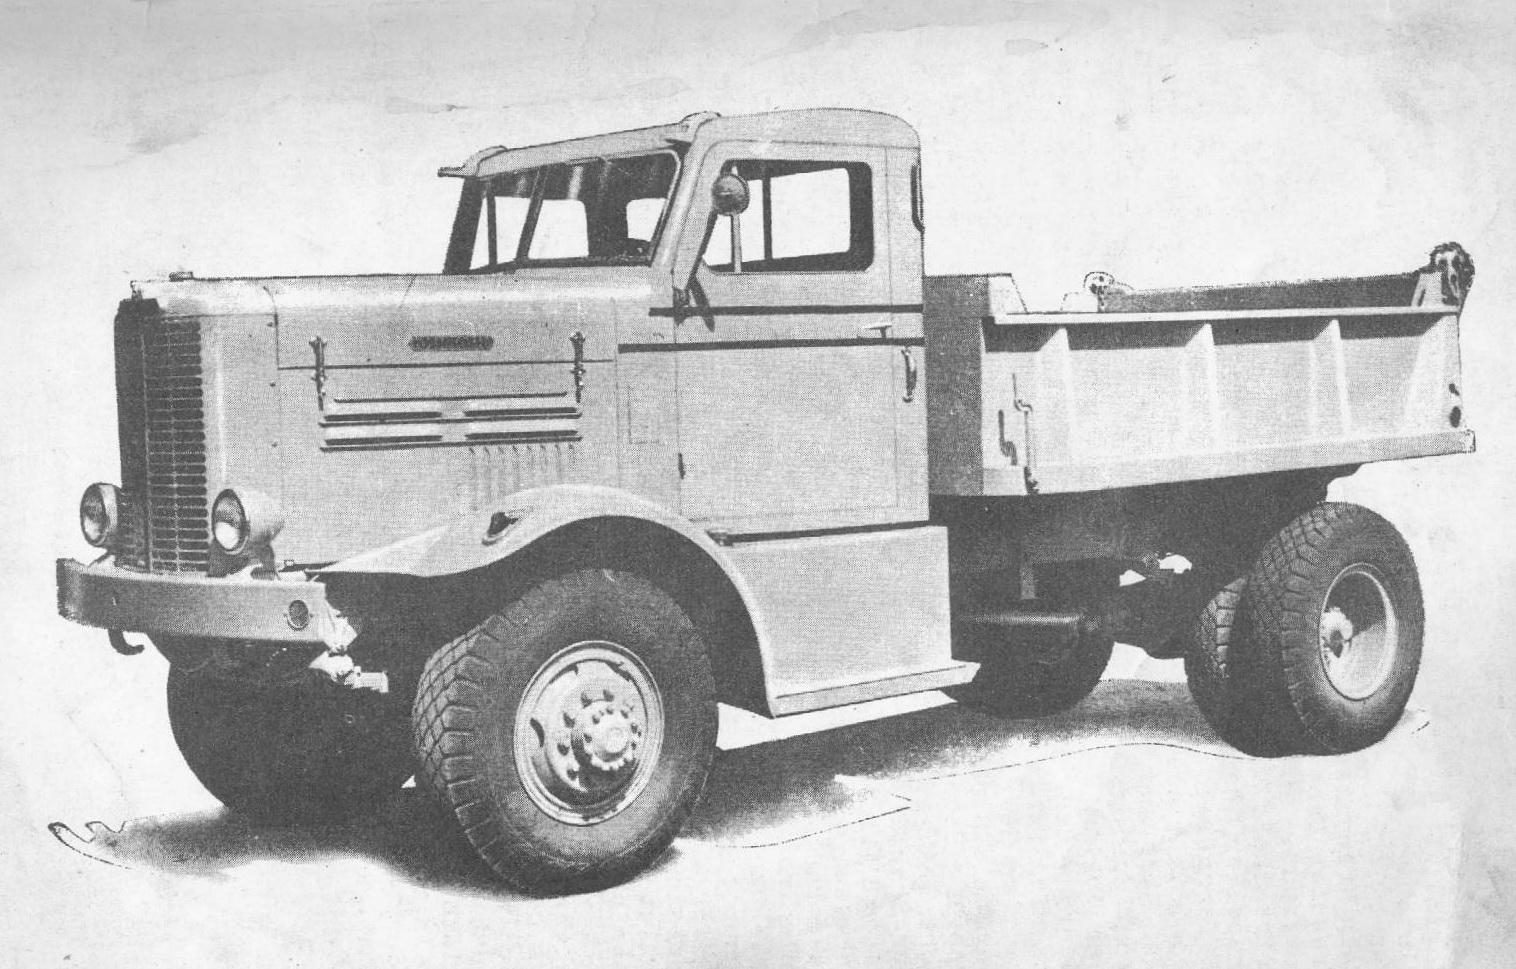 Oshkosh-4x4-truck-W-712